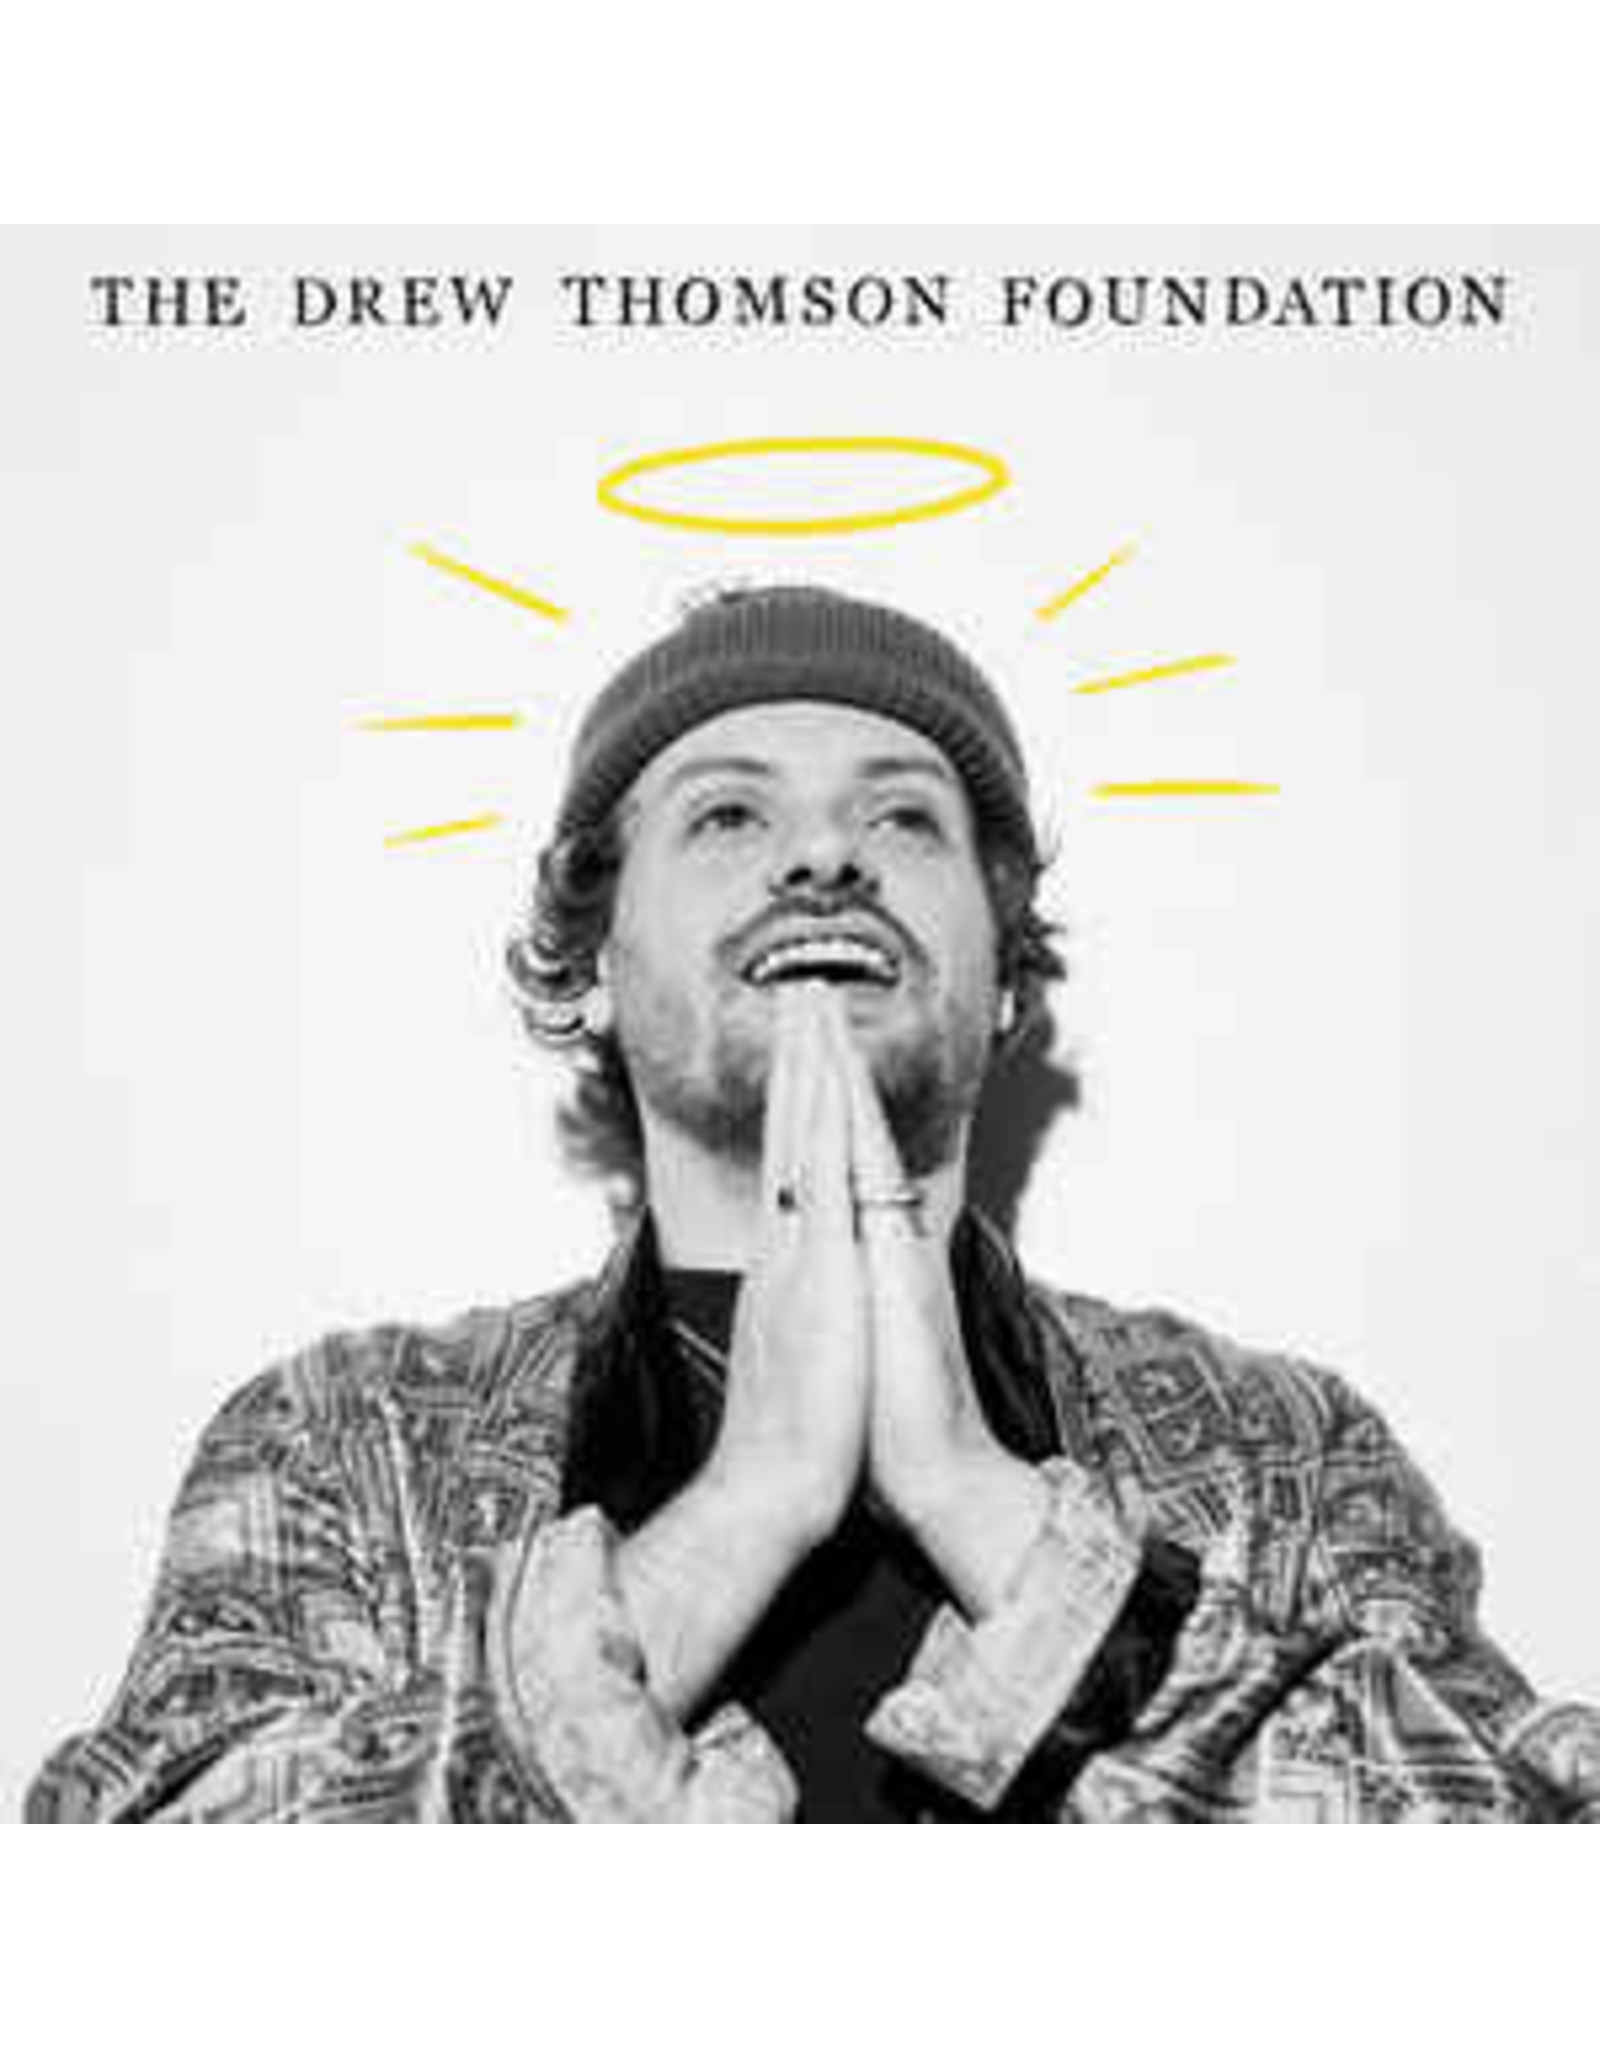 Thomson, Drew - Foundation LP